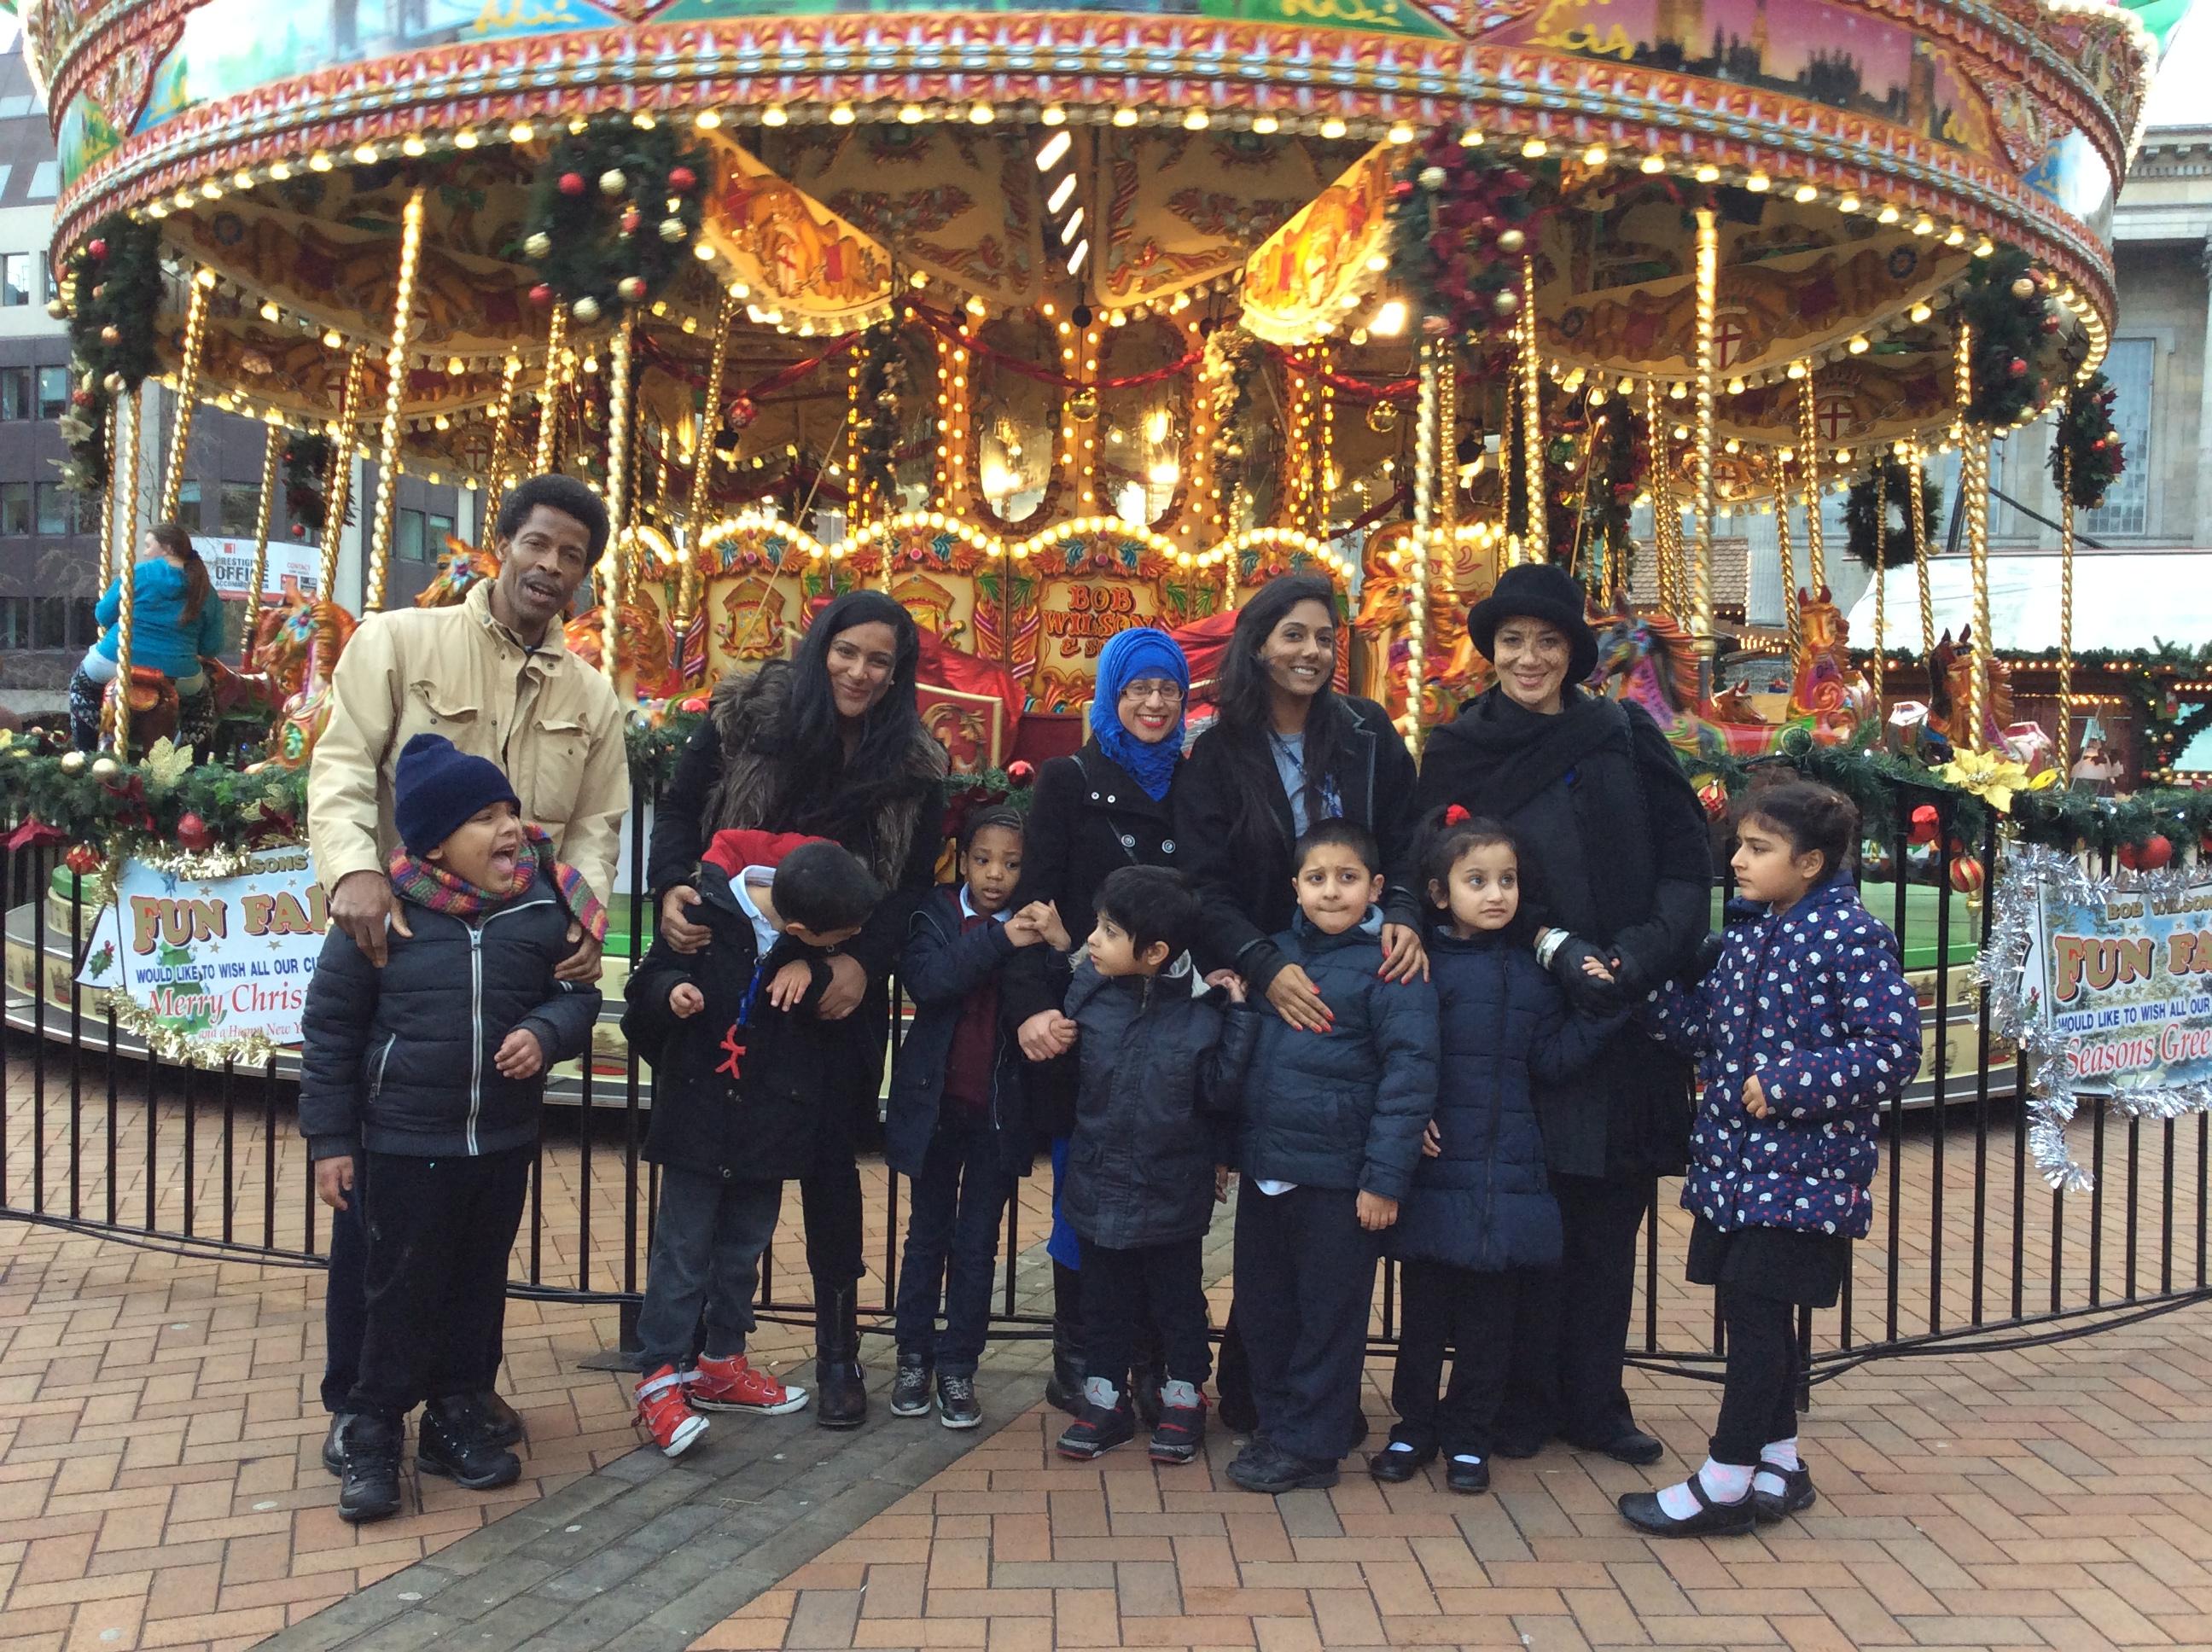 mayfield school - Birmingham Christmas Market